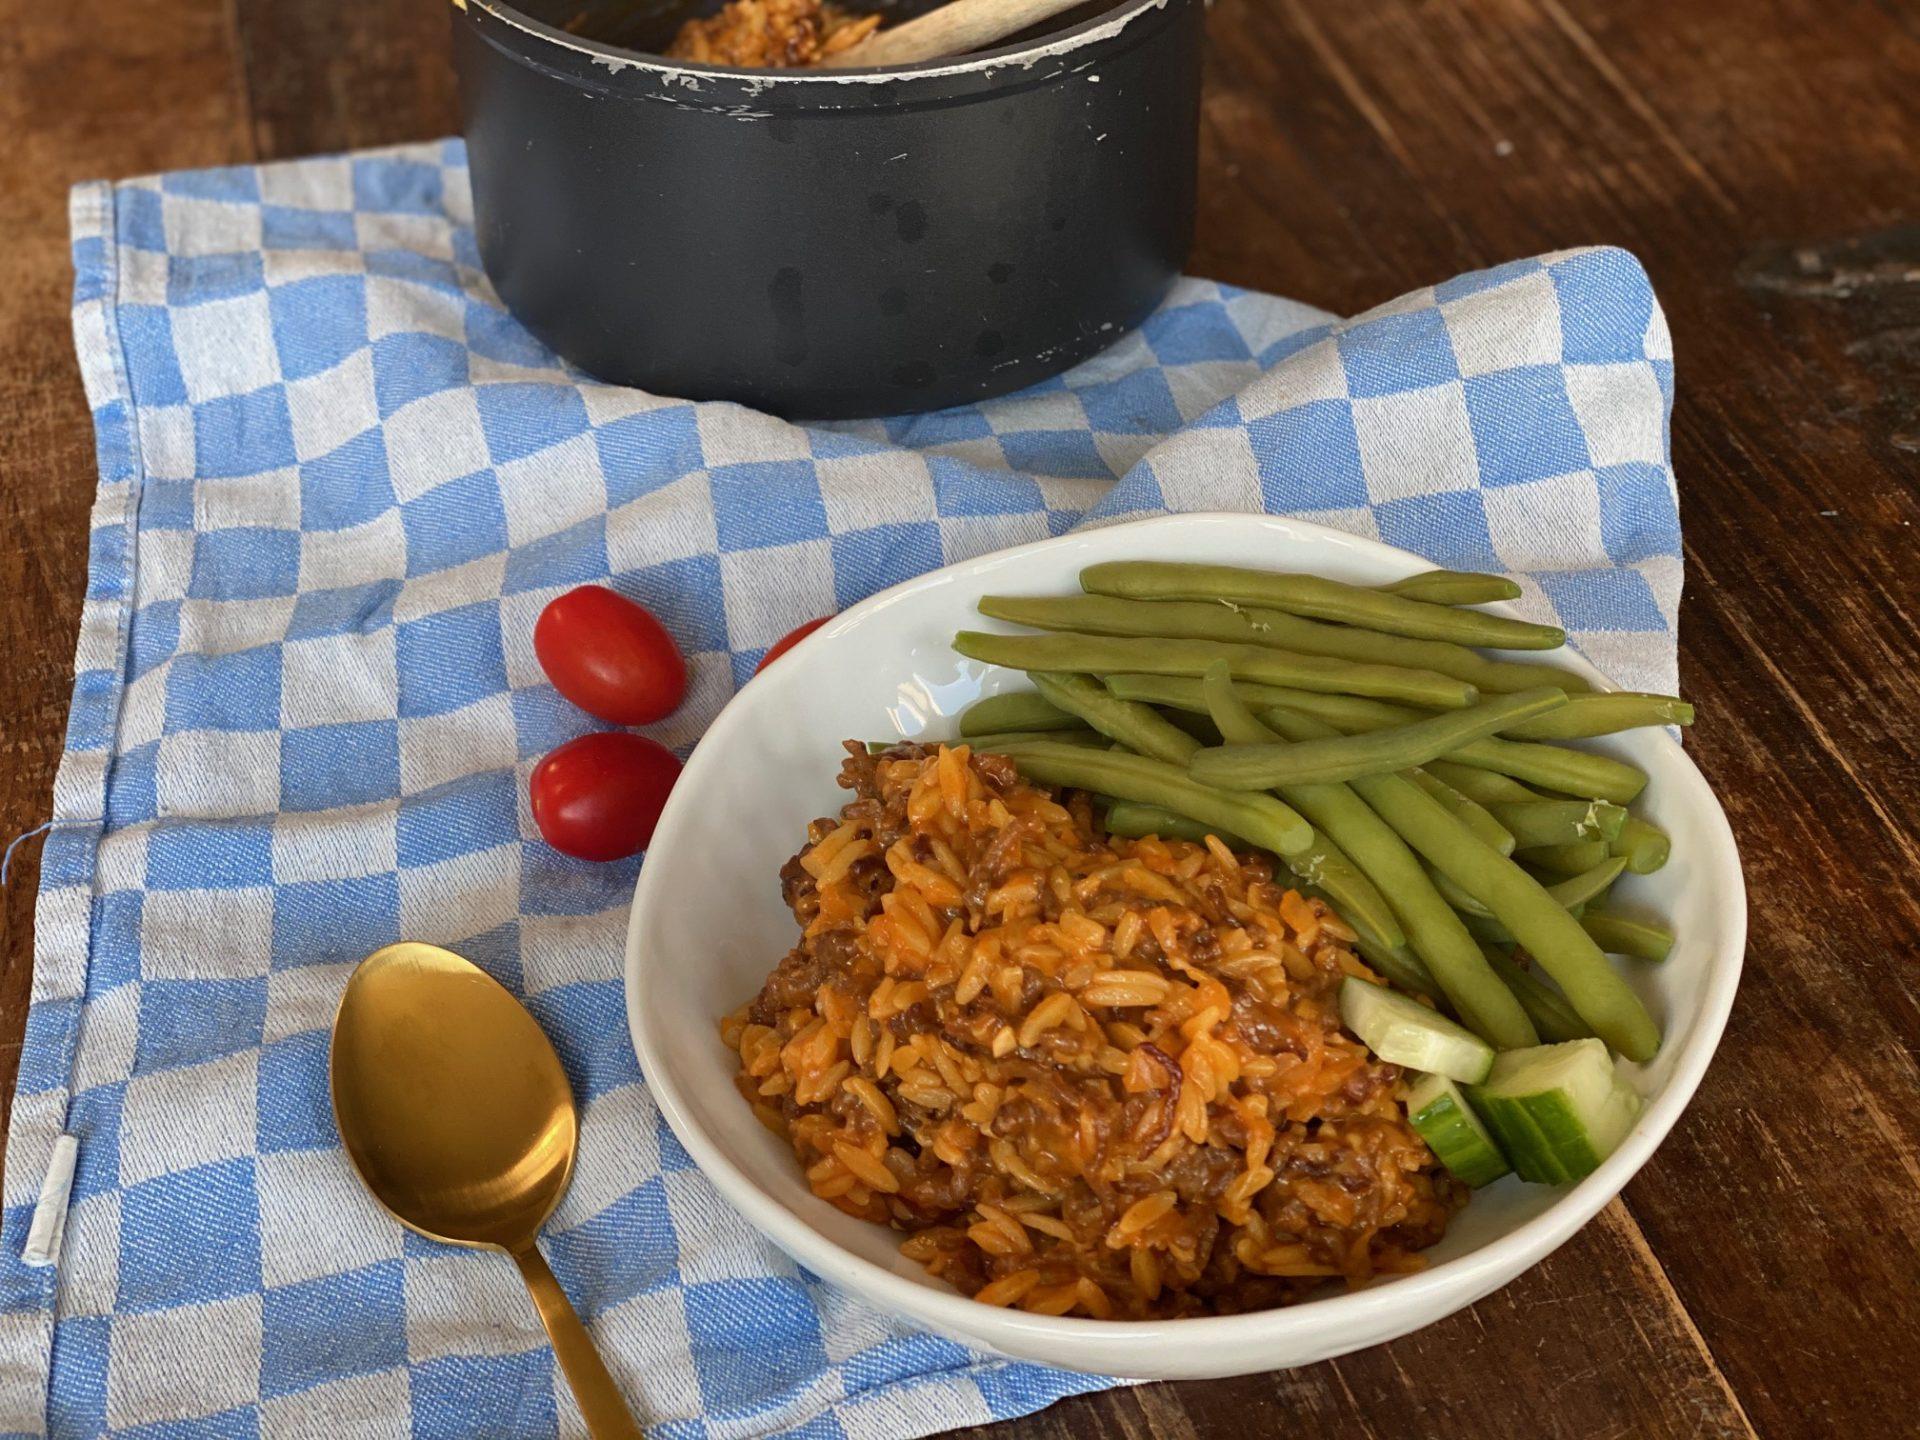 Orzo Bolognaise - Risoni Bolognaise recept van Foodblog Foodinista